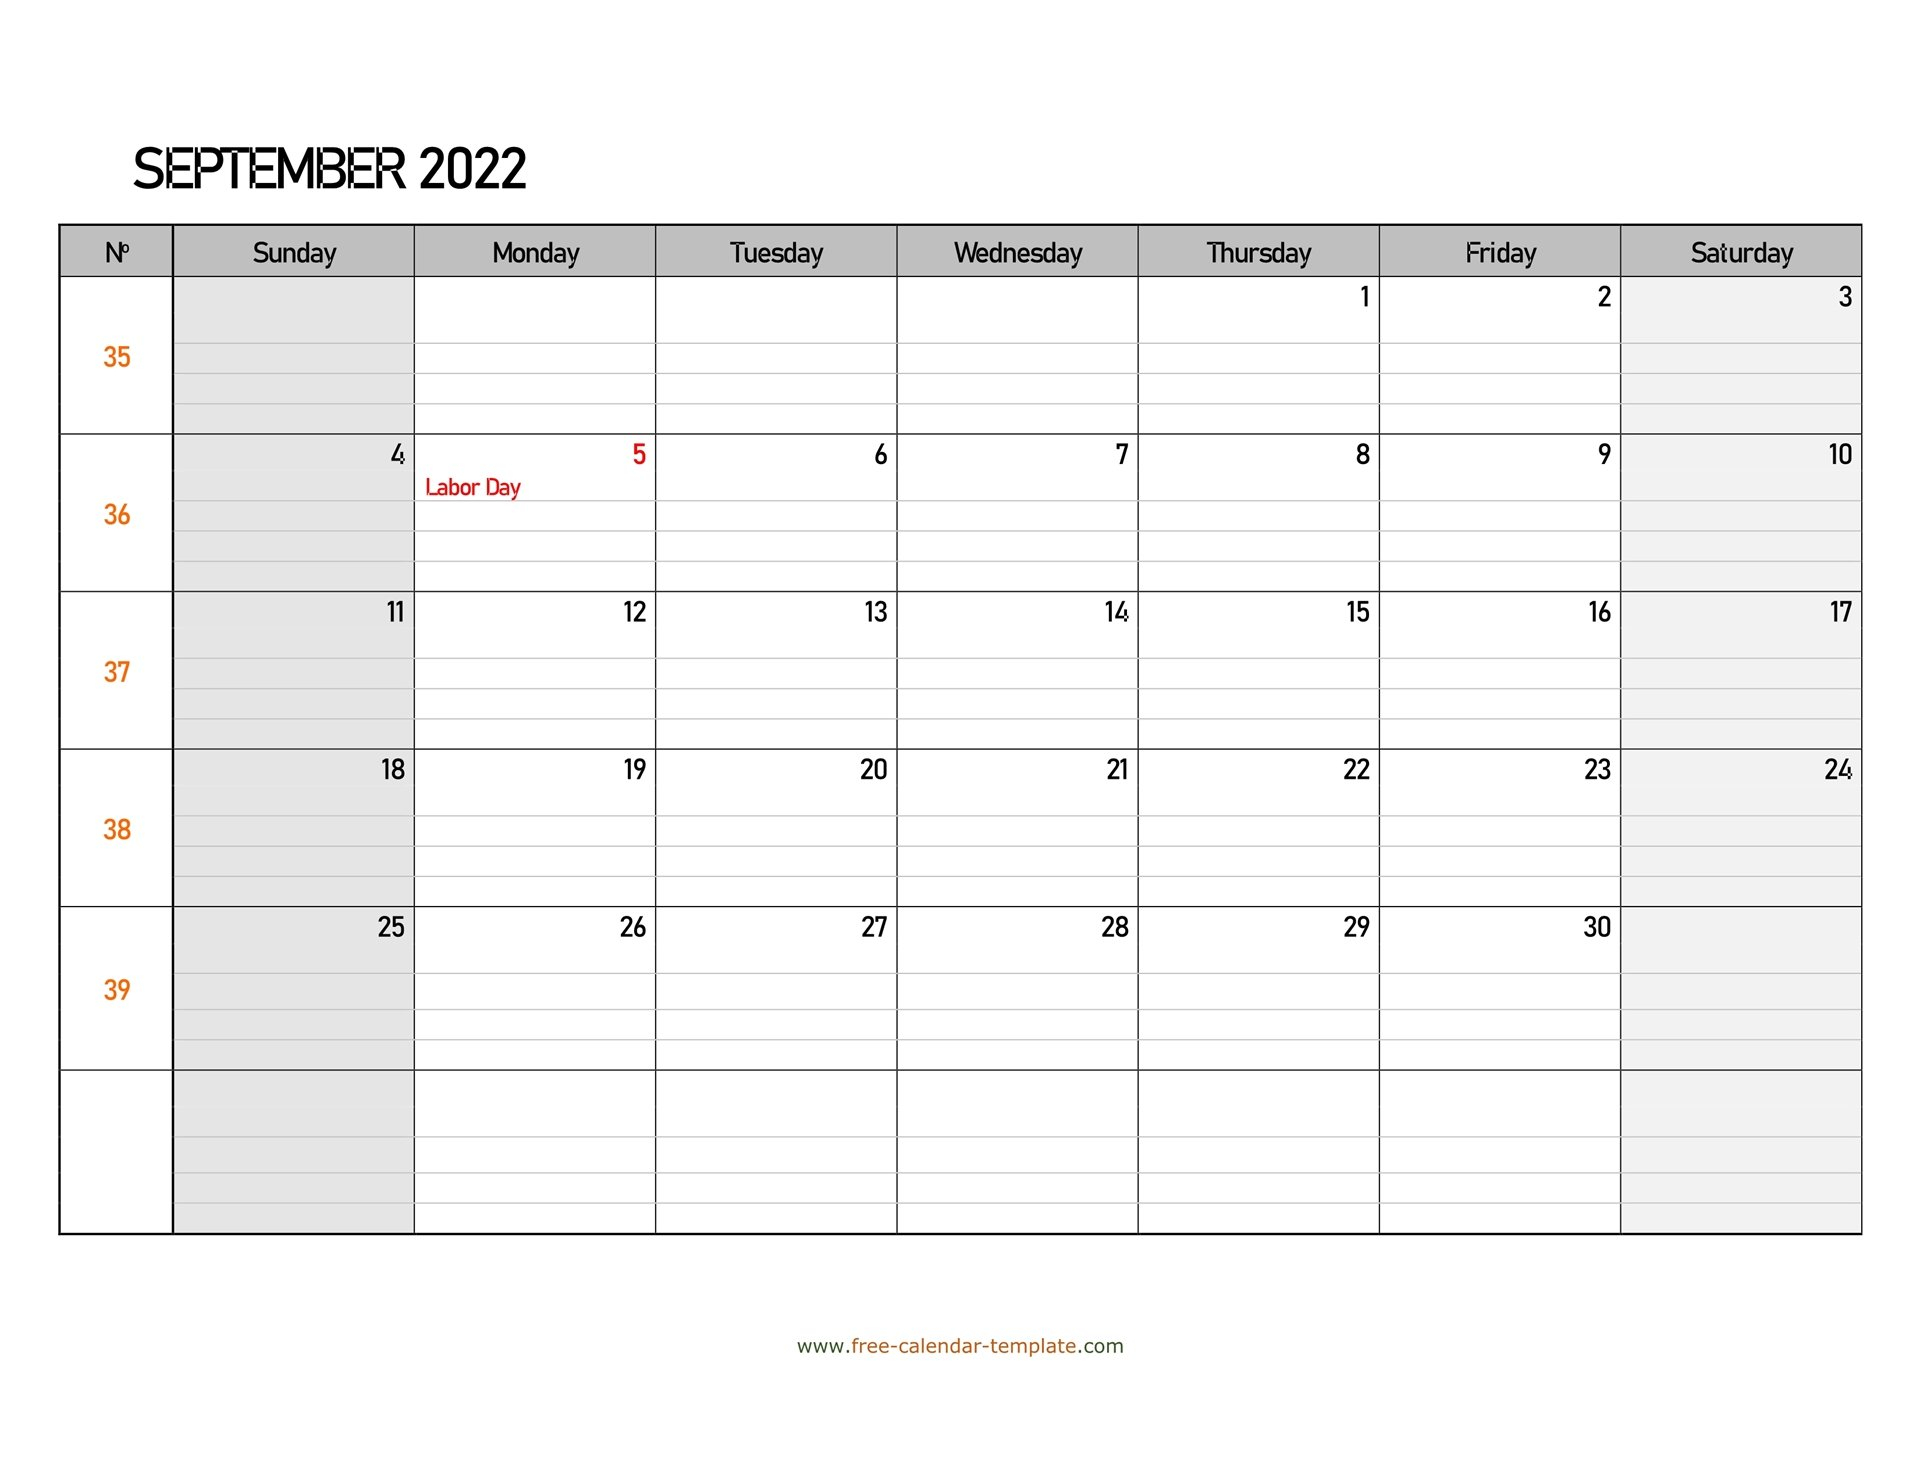 September 2022 Free Calendar Tempplate   Free-Calendar intended for September 2022 Calendar Template